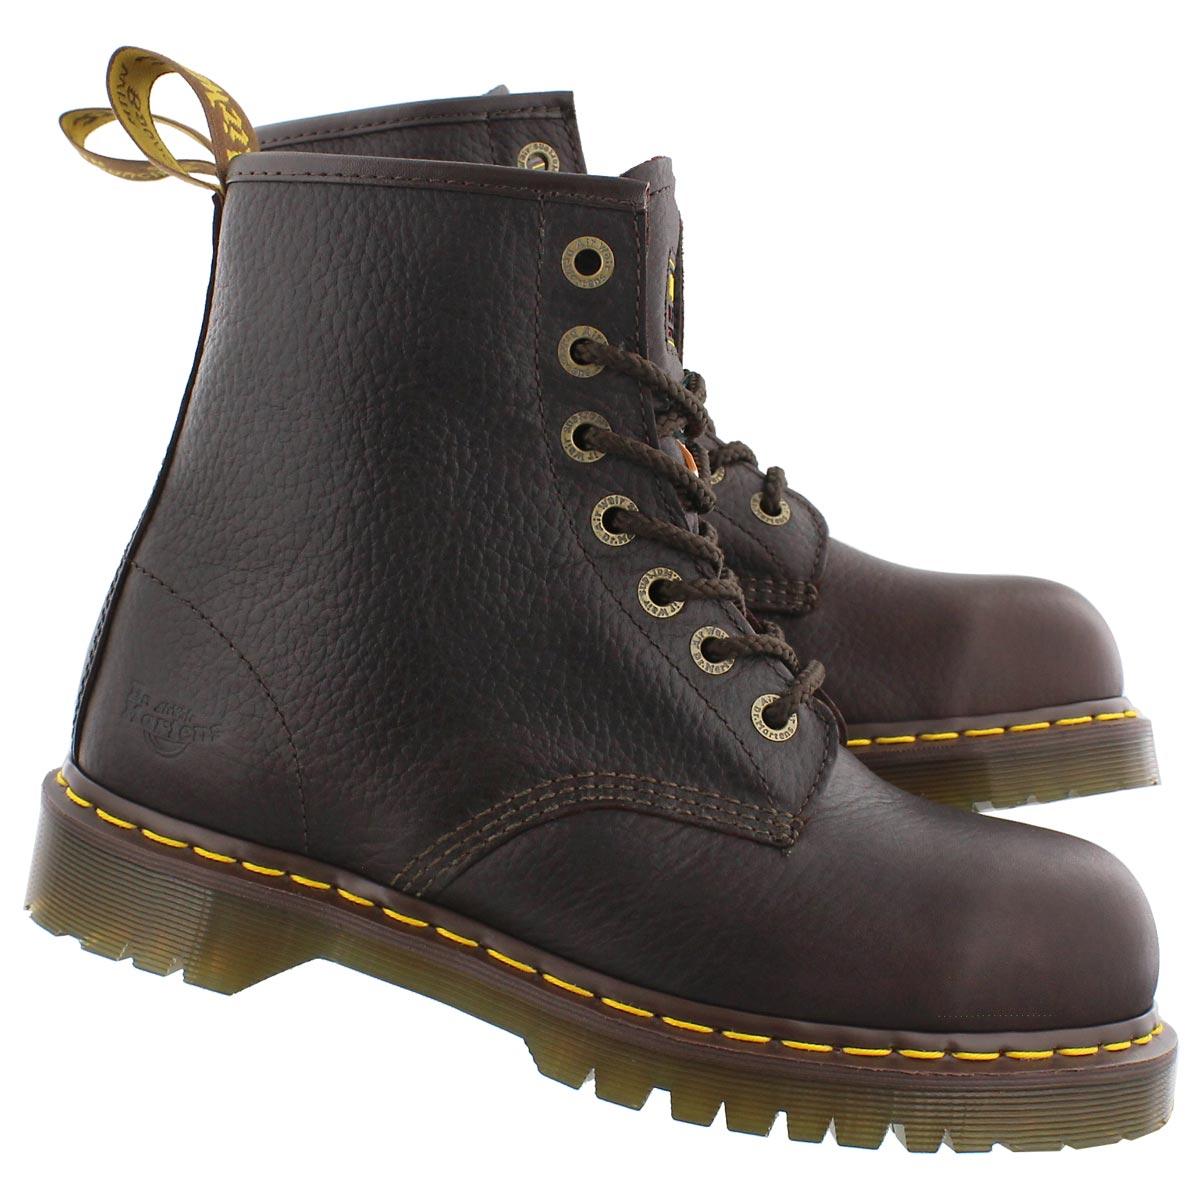 Mns Icon 7B10 ST bark CSA safety boot